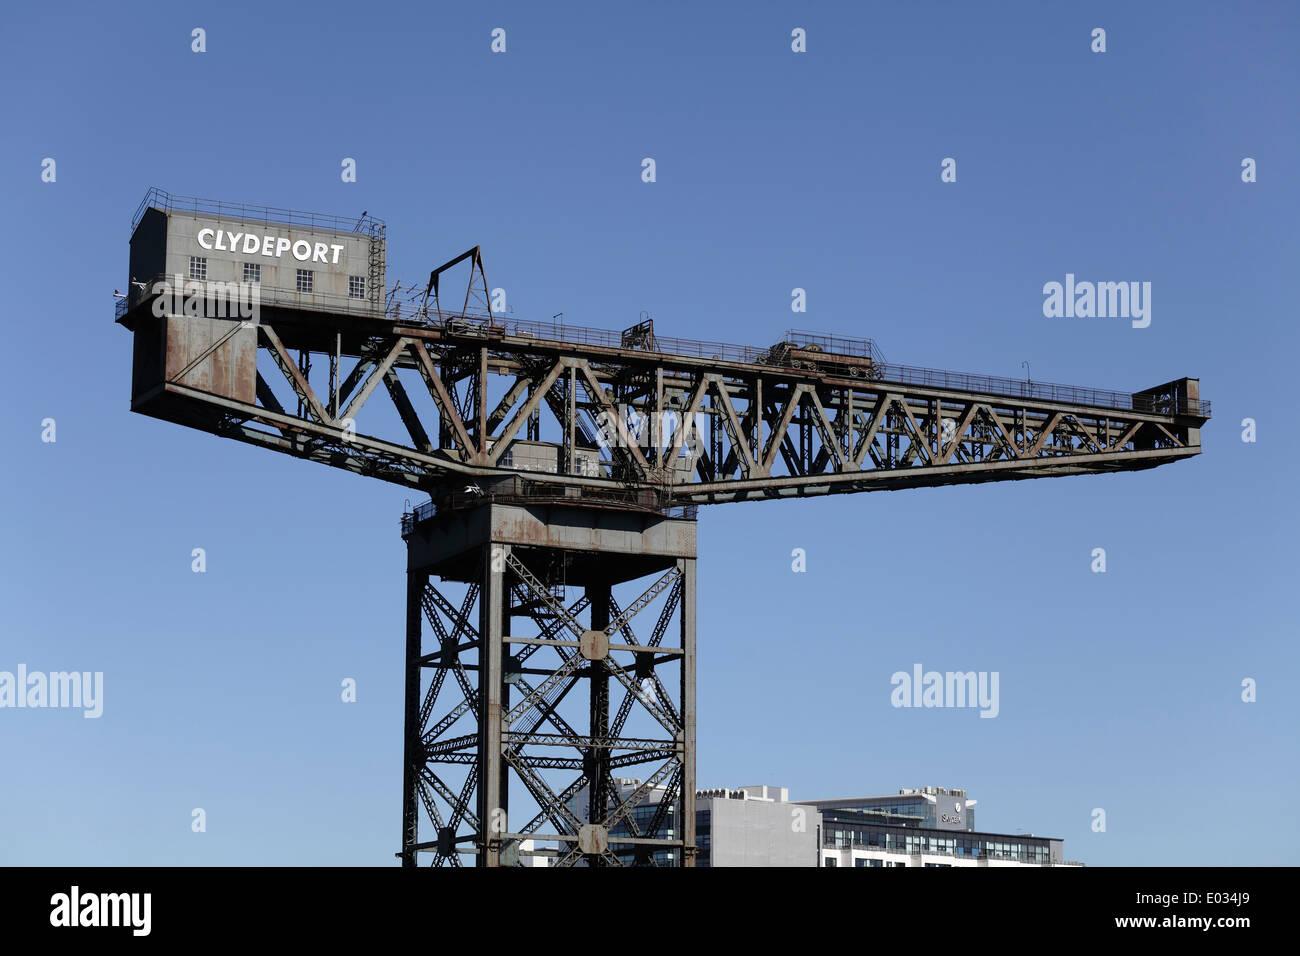 The Finnieston Titan Crane in Glasgow, Scotland, UK - Stock Image